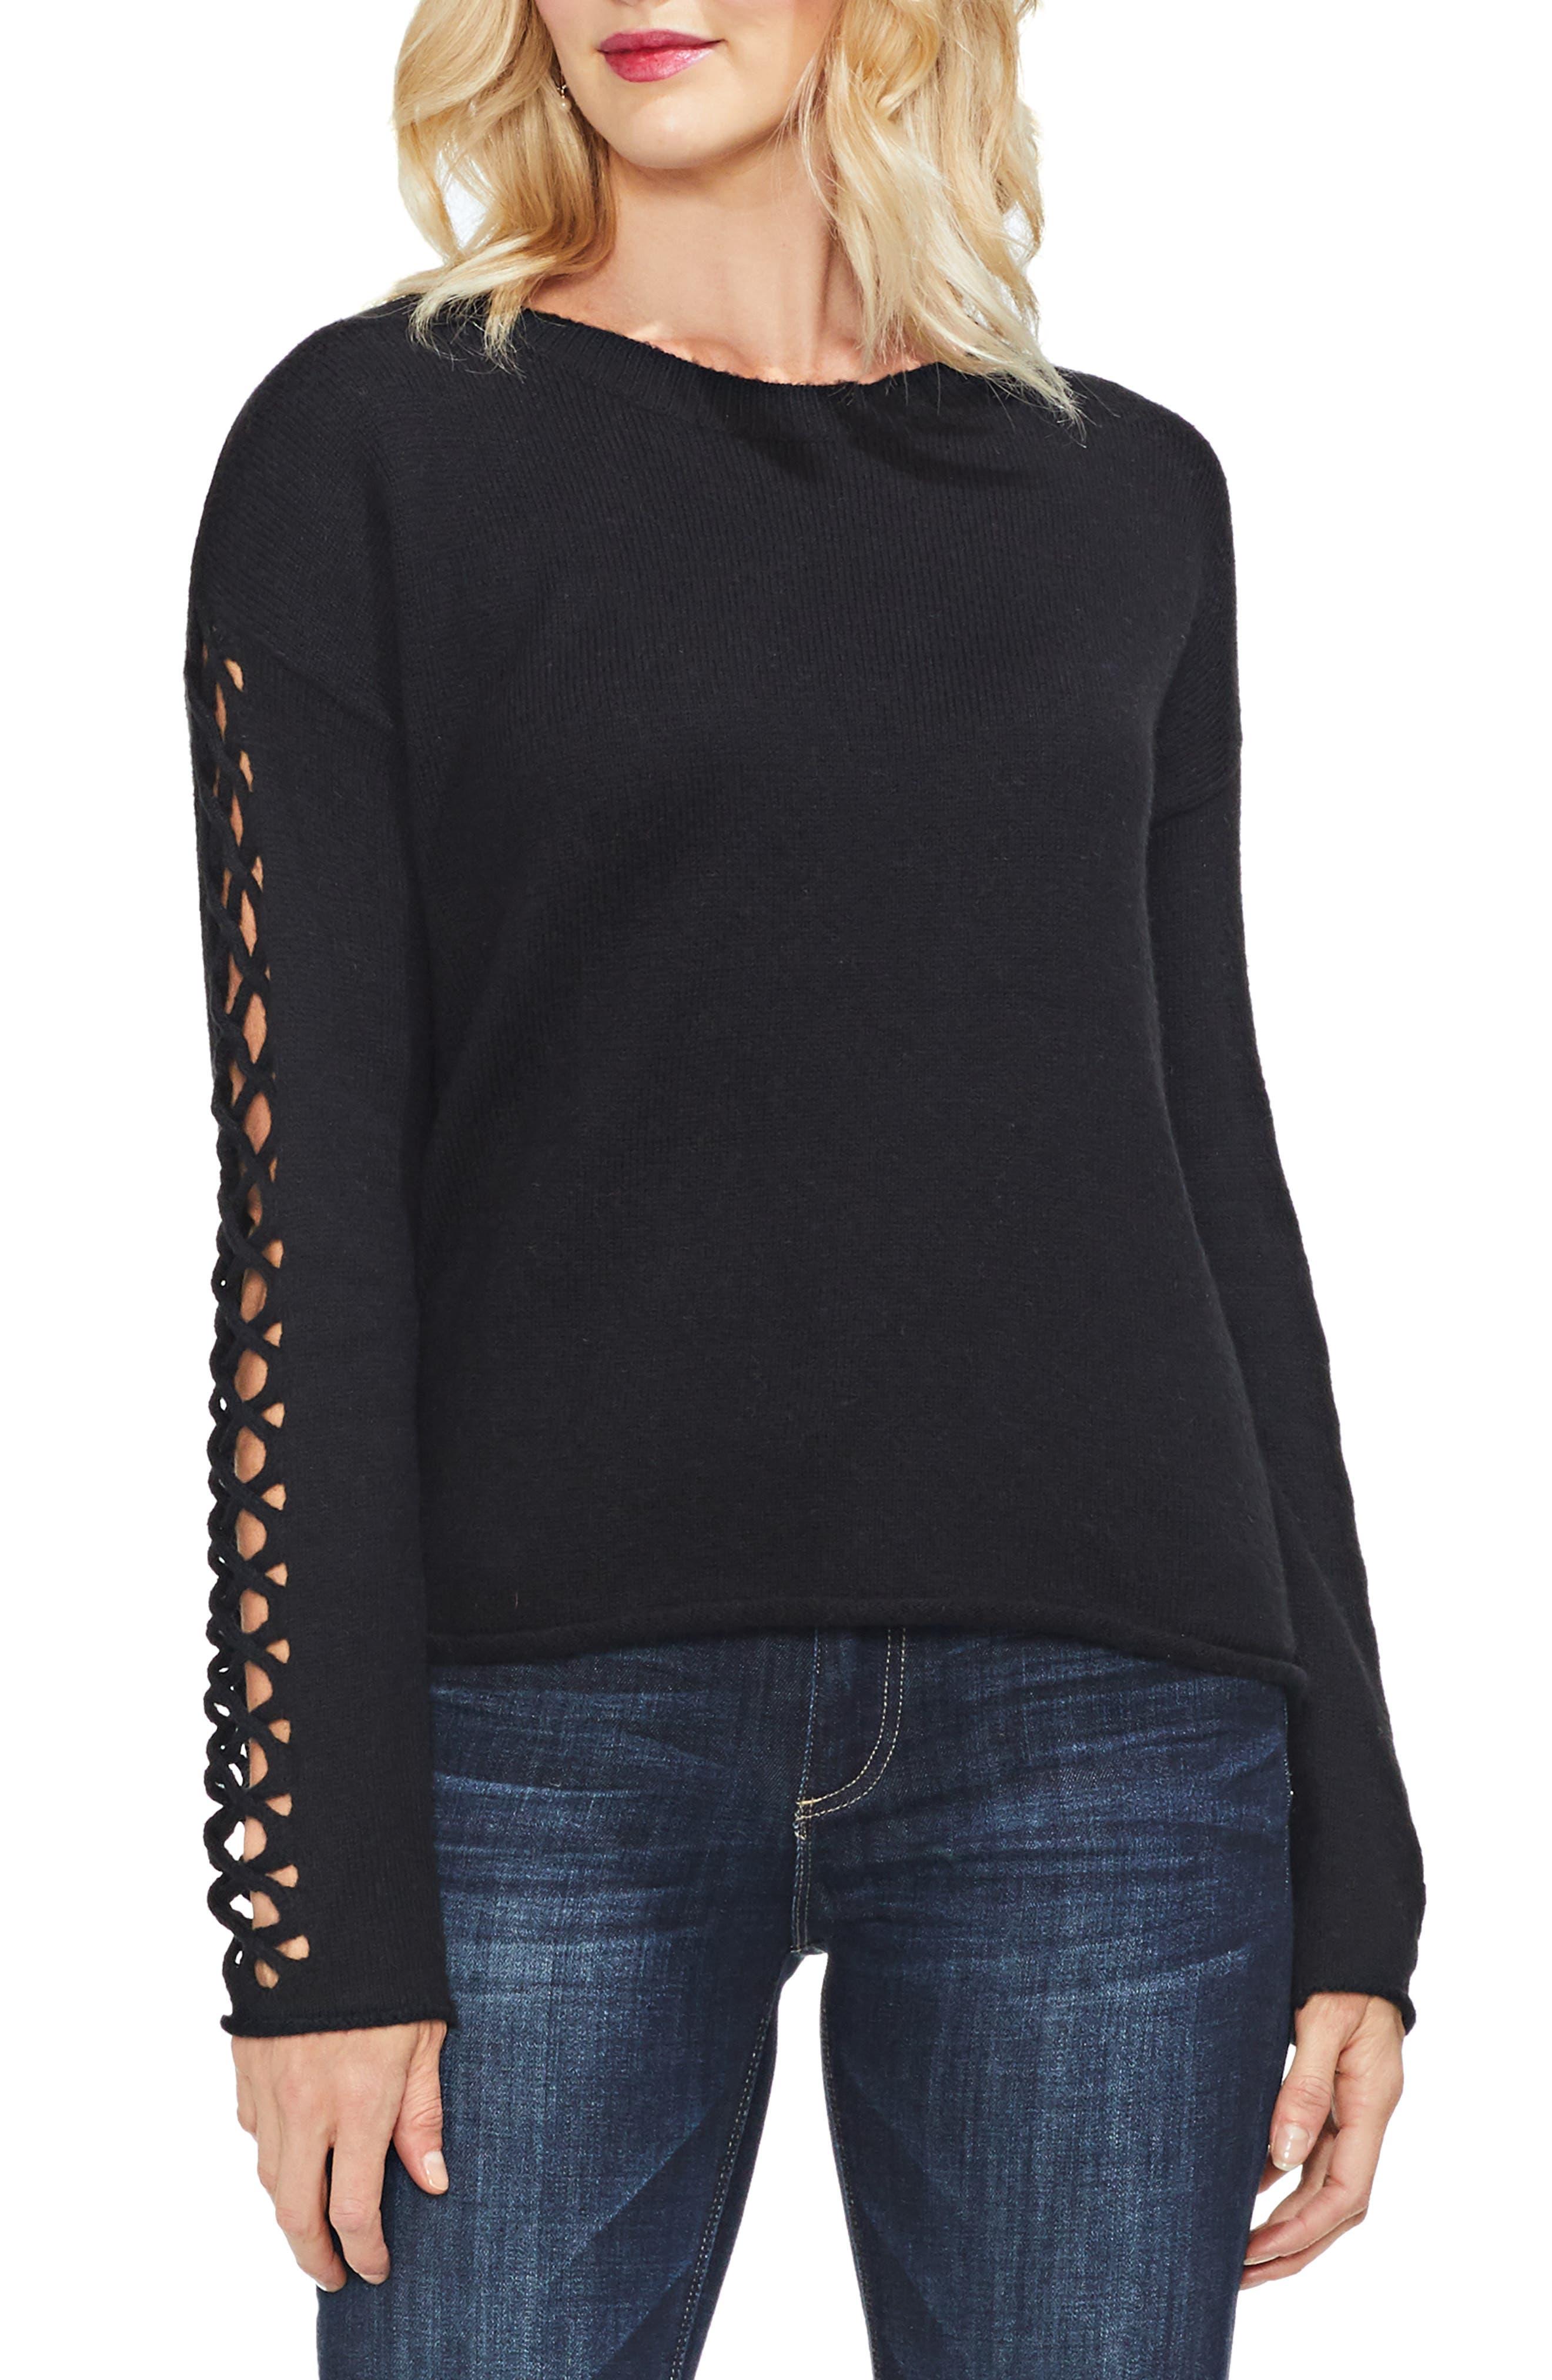 VINCE CAMUTO Lattice Sleeve Cotton Blend Sweater, Main, color, 006